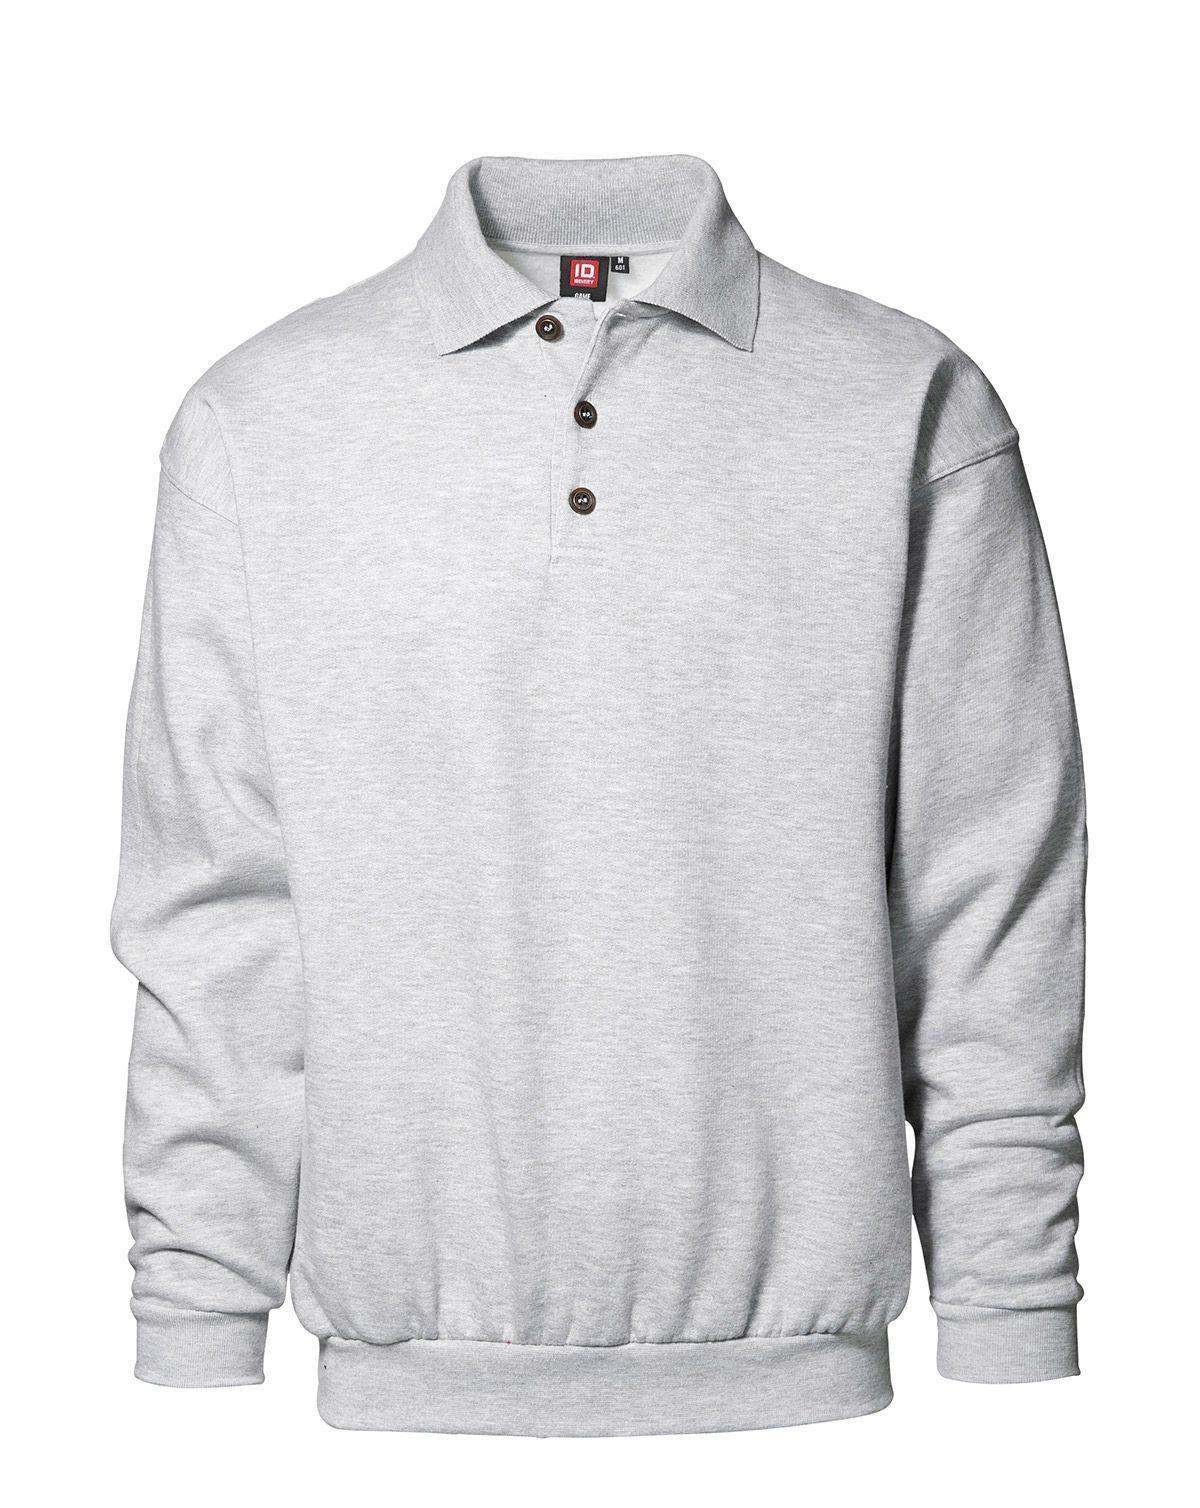 ID Klassisk Polosweatshirt (Ljusgrå, S)